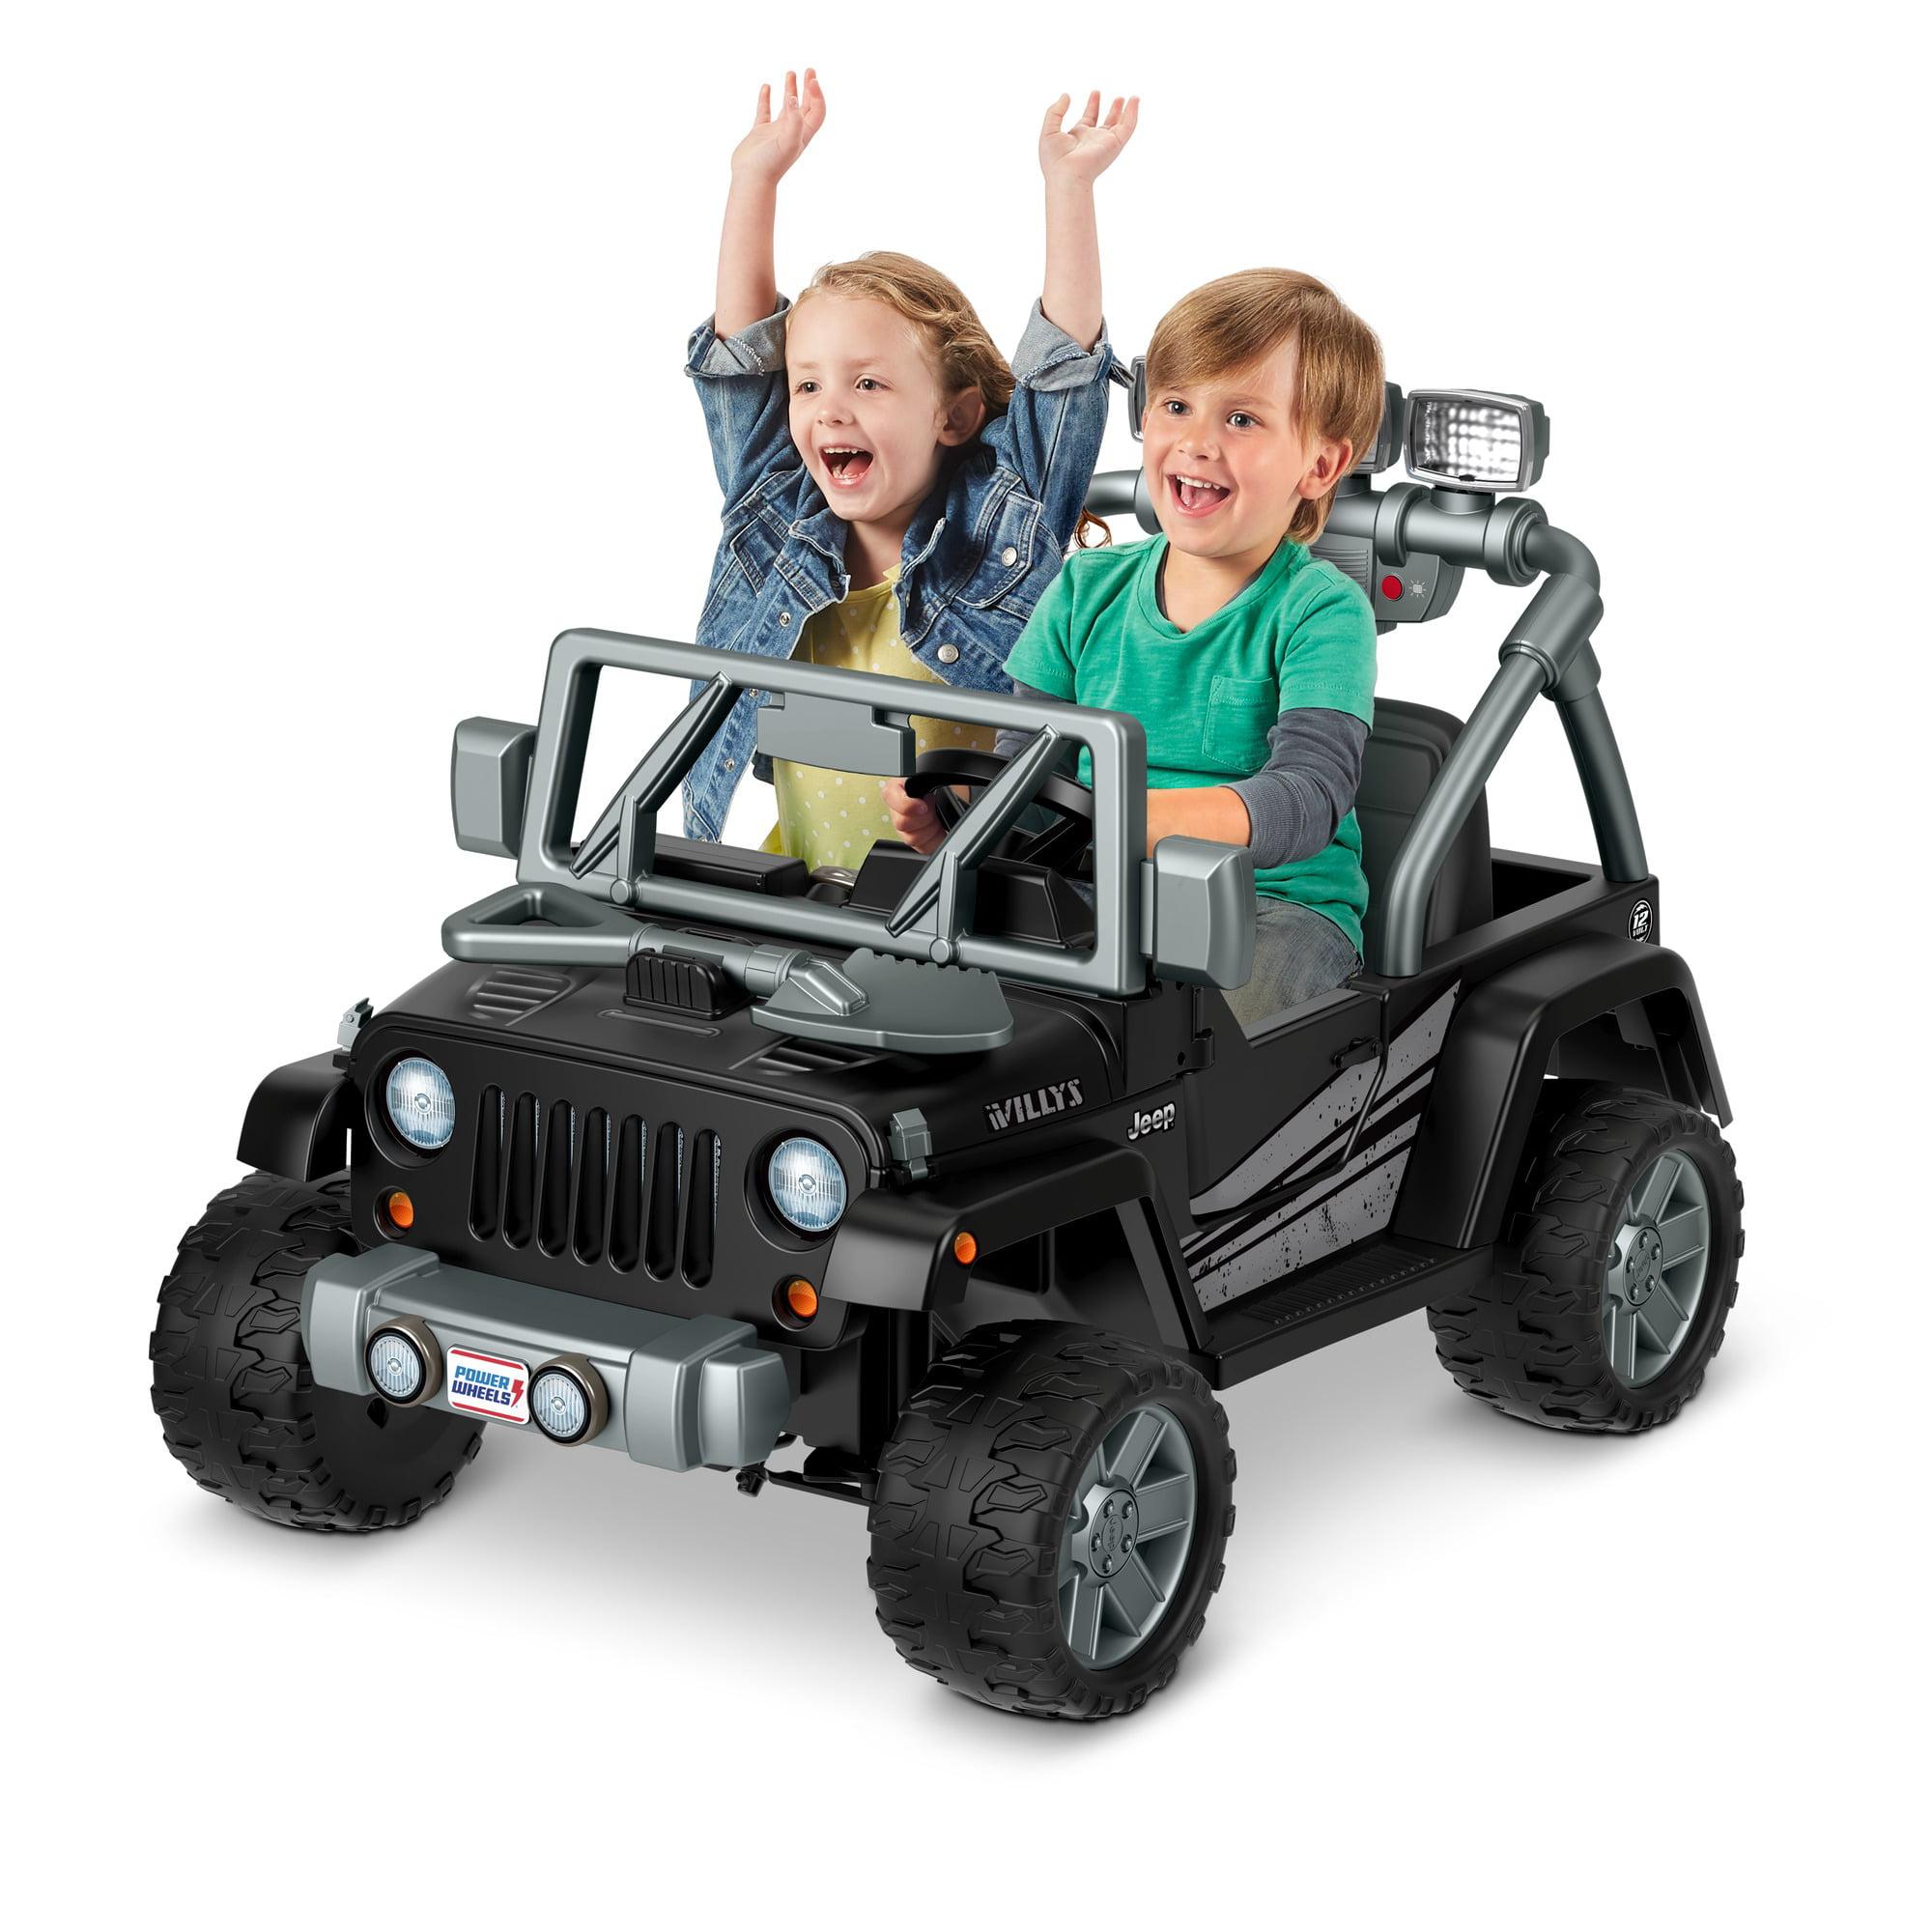 Jeep Wrangler Wheels >> Power Wheels Jeep Wrangler Willys Ride On Vehicle Walmart Com